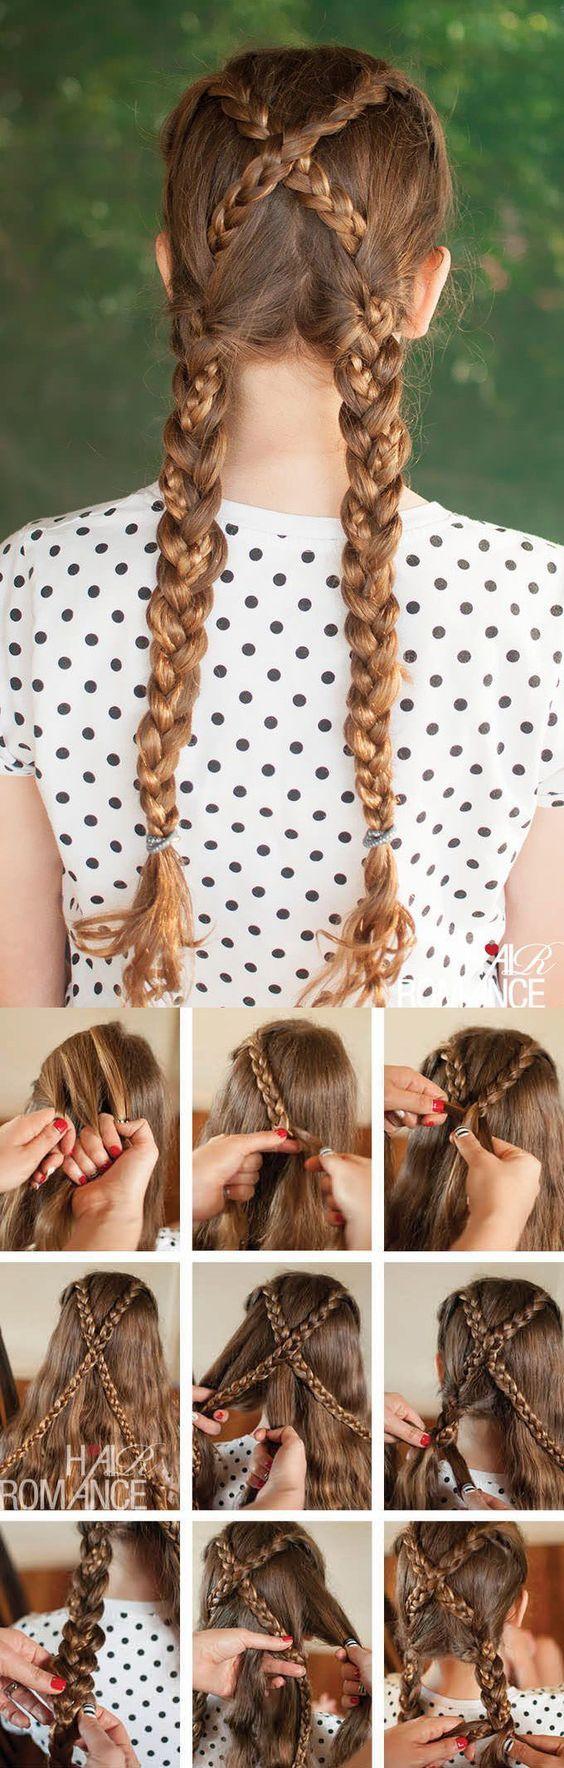 ideias de penteados para meninas hair style curly and hair